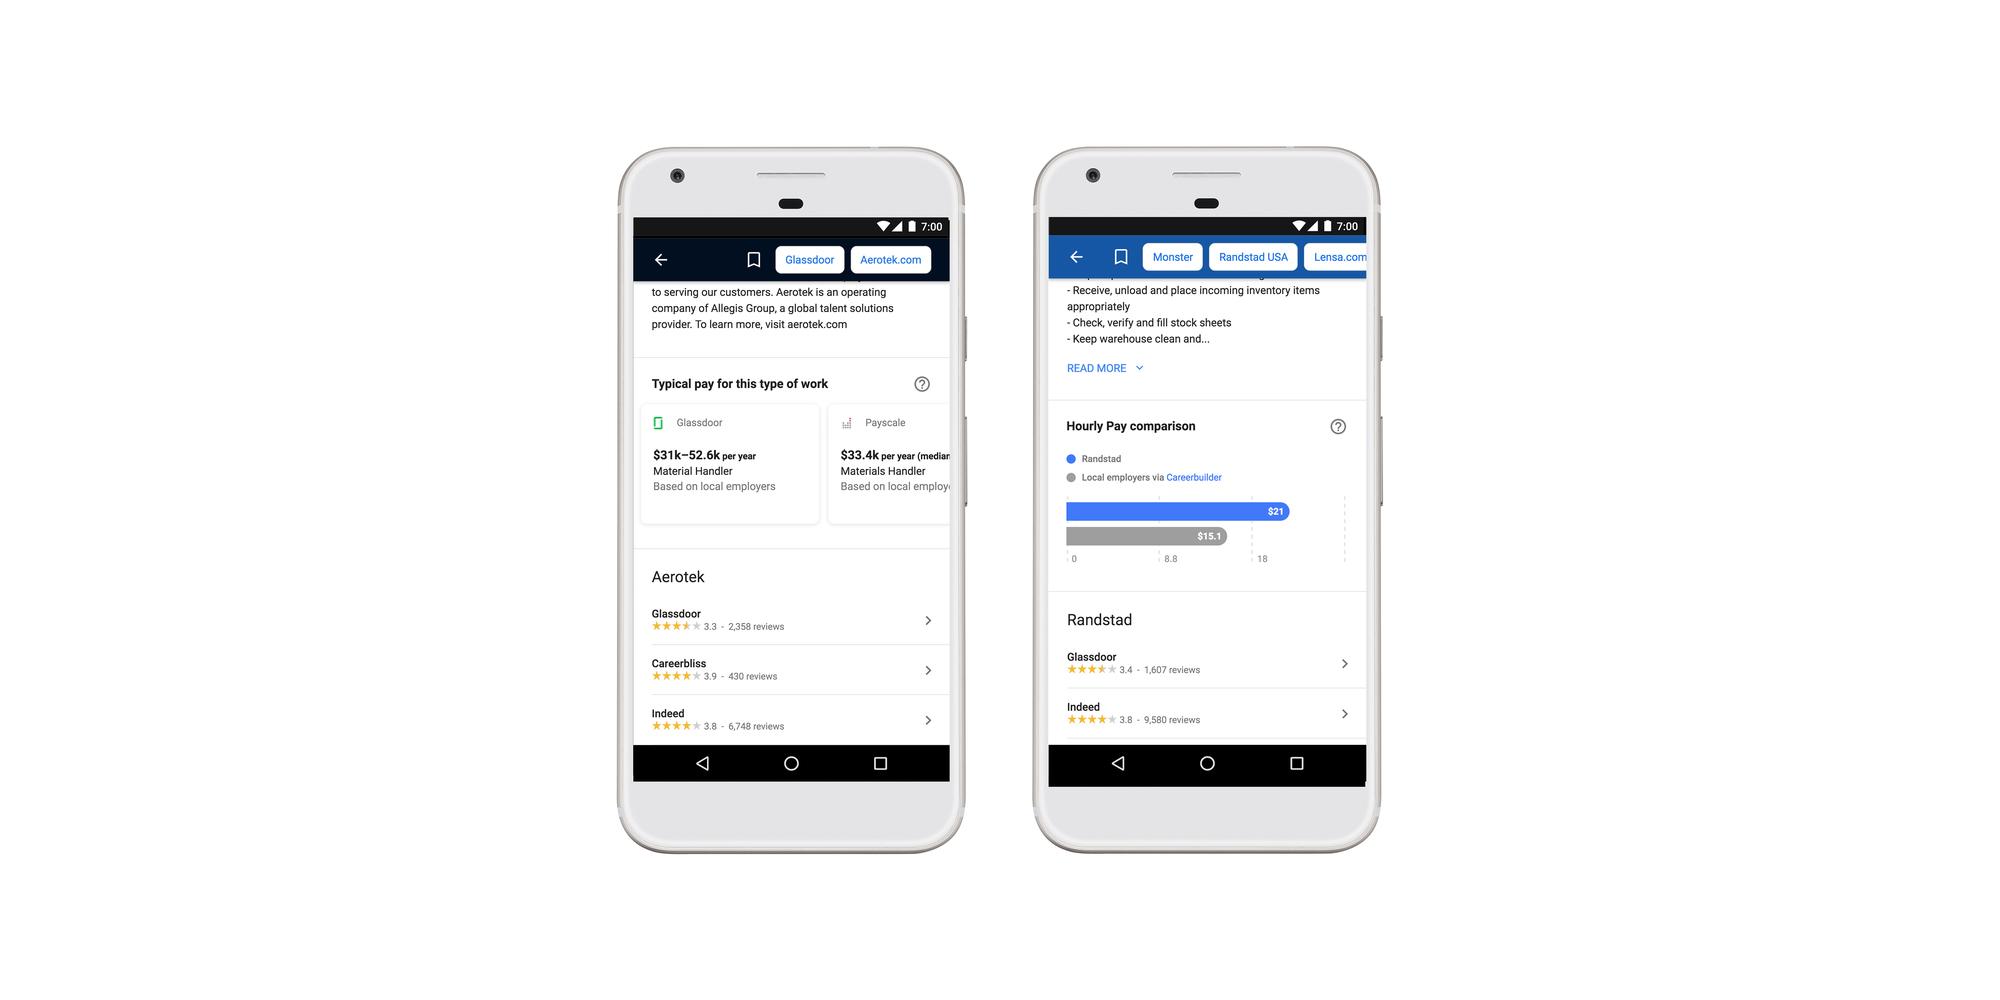 Google's job search platform now shows salaries, adds